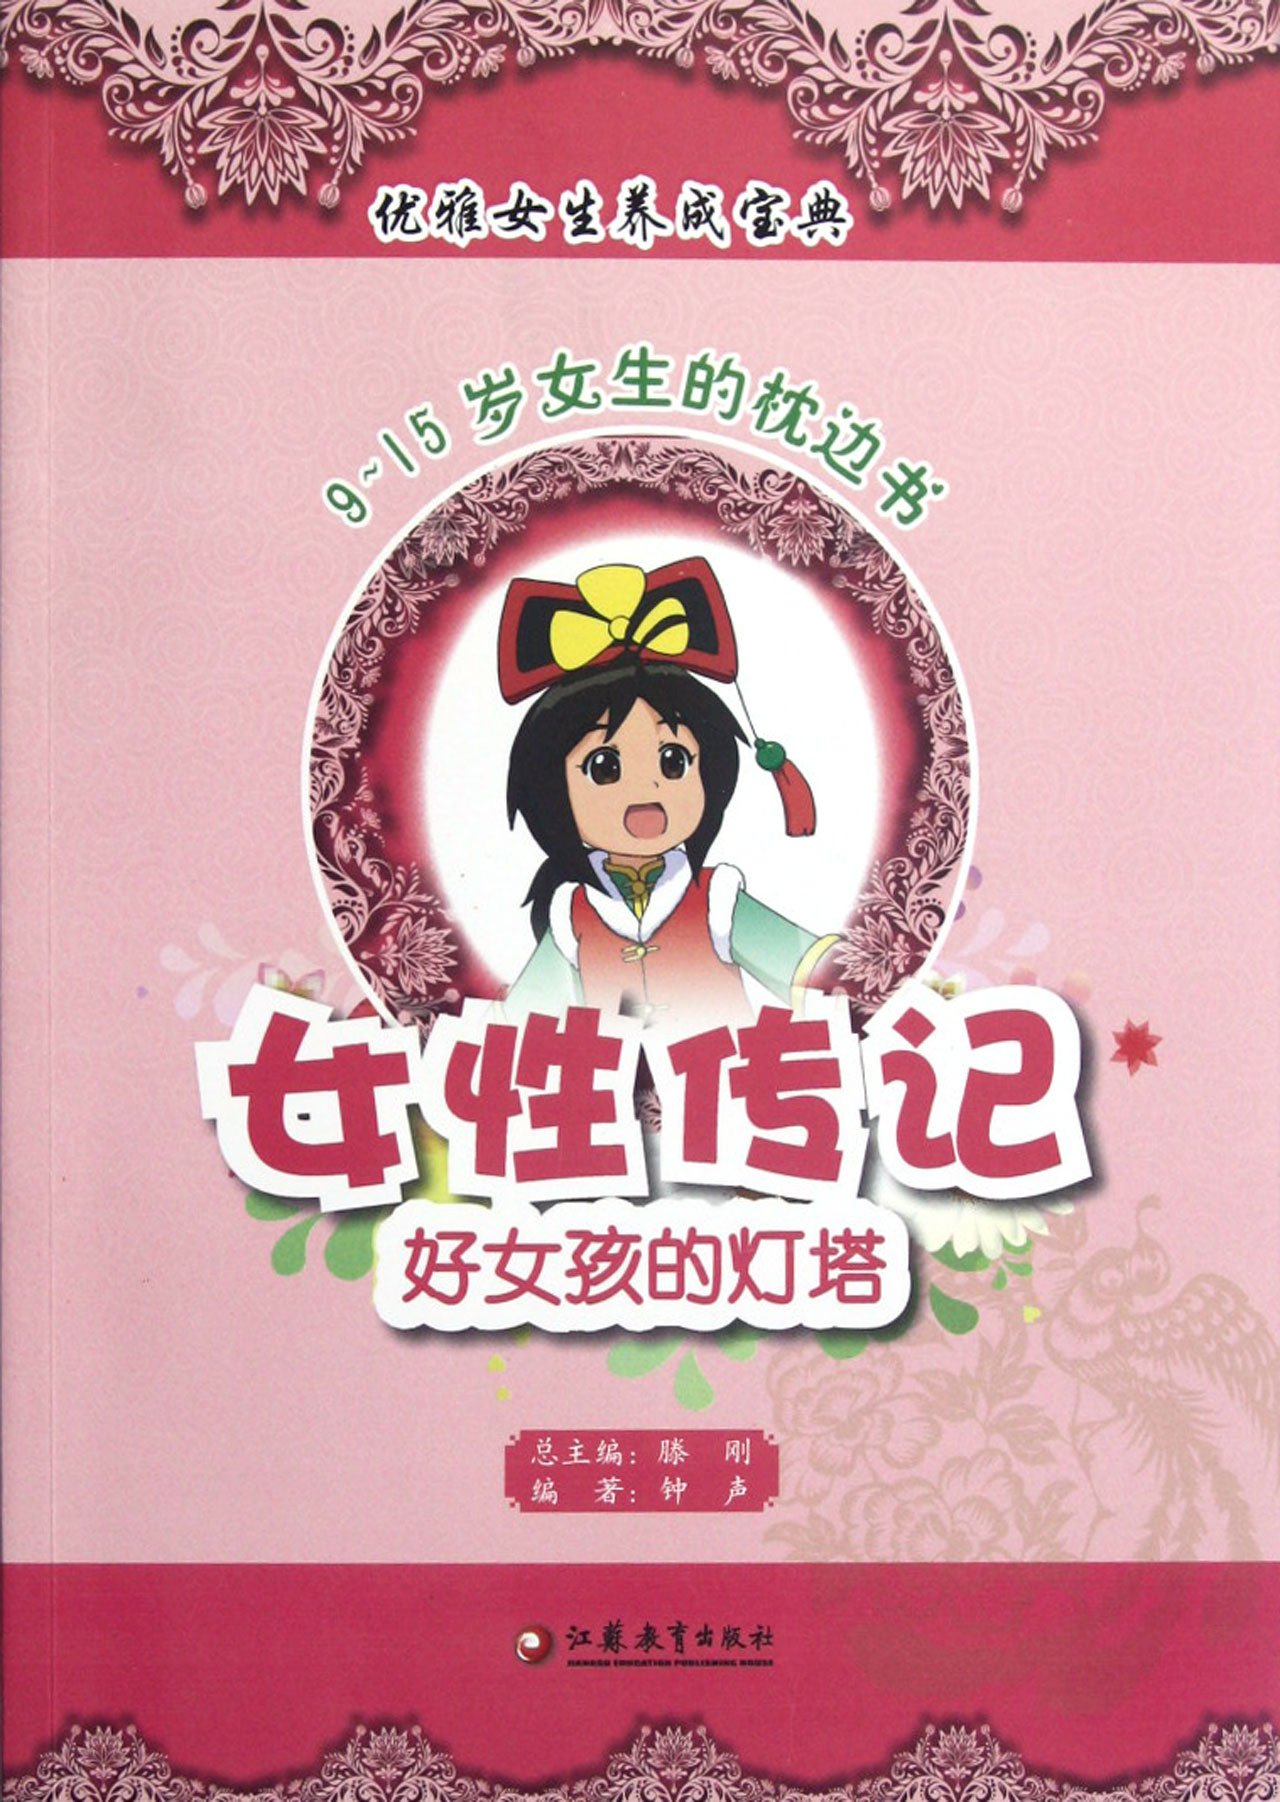 Download Biography of Women - Good Girls Lighthouse - 9 ~ 15 Year-old Girls Handbook (Chinese Edition) PDF